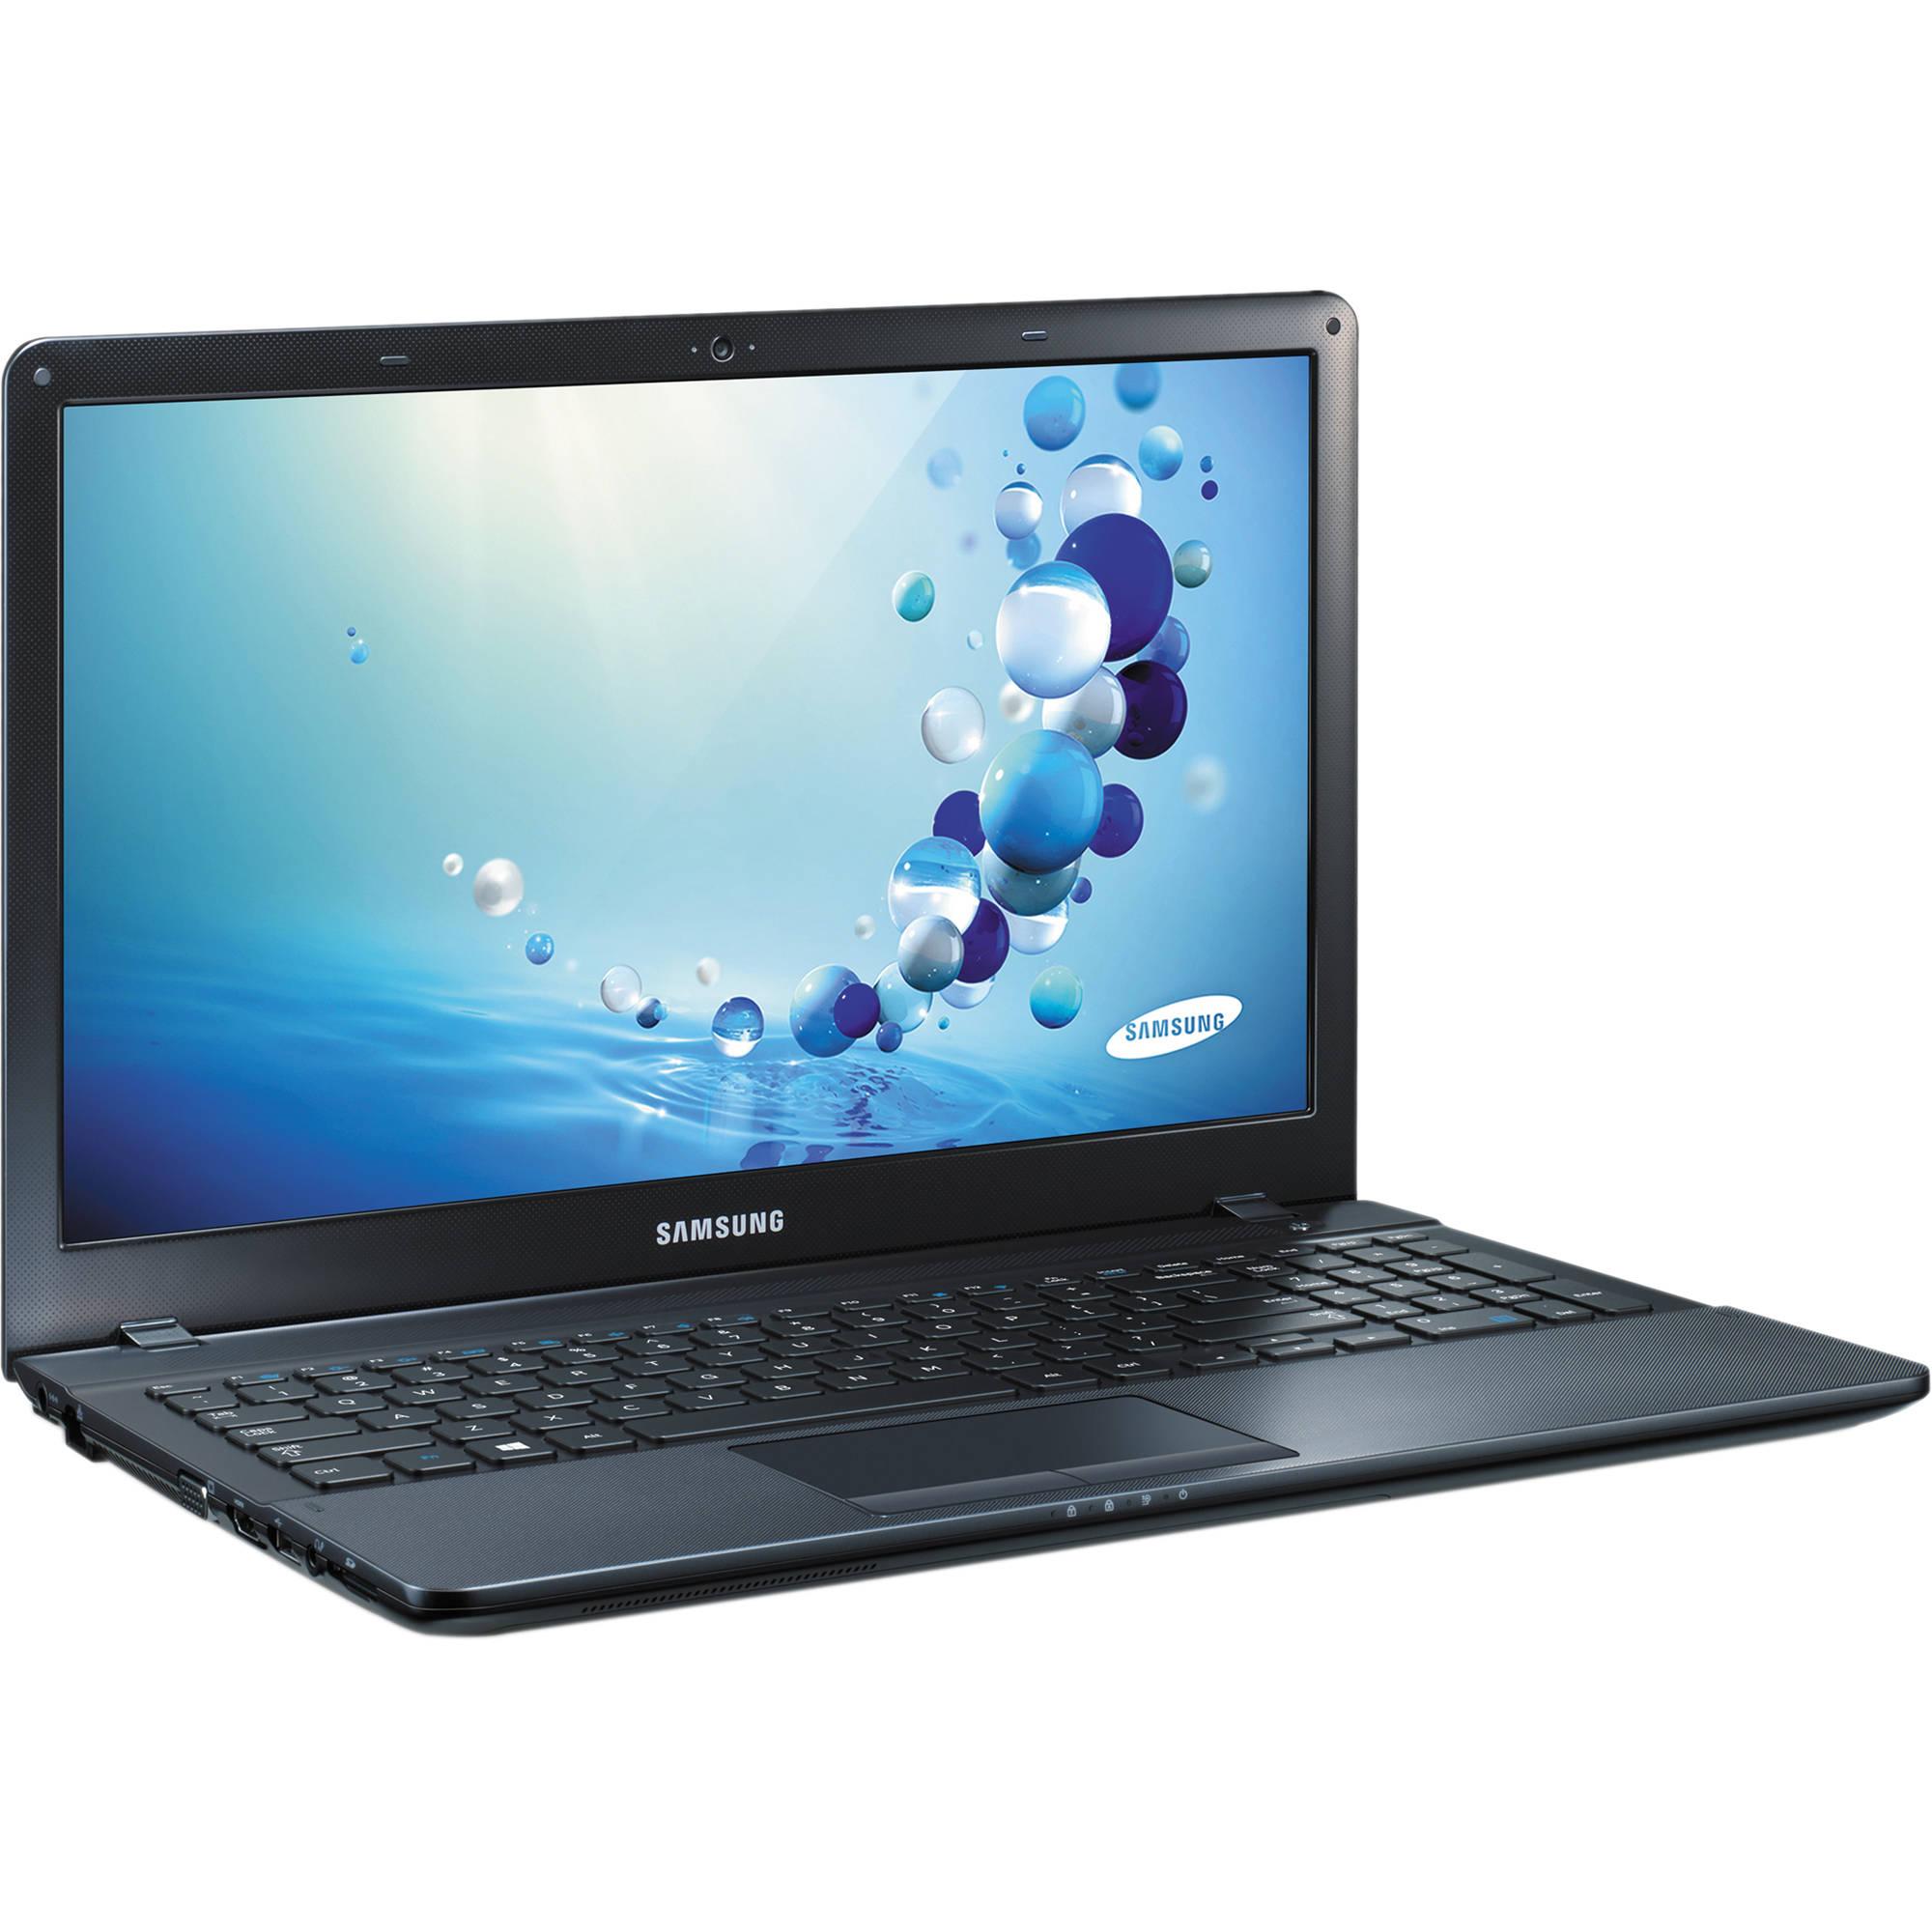 Notebook samsung dual core 4gb - Samsung Ativ Book 2 Np270e5g K03us Notebook Computer Mineral Ash Black